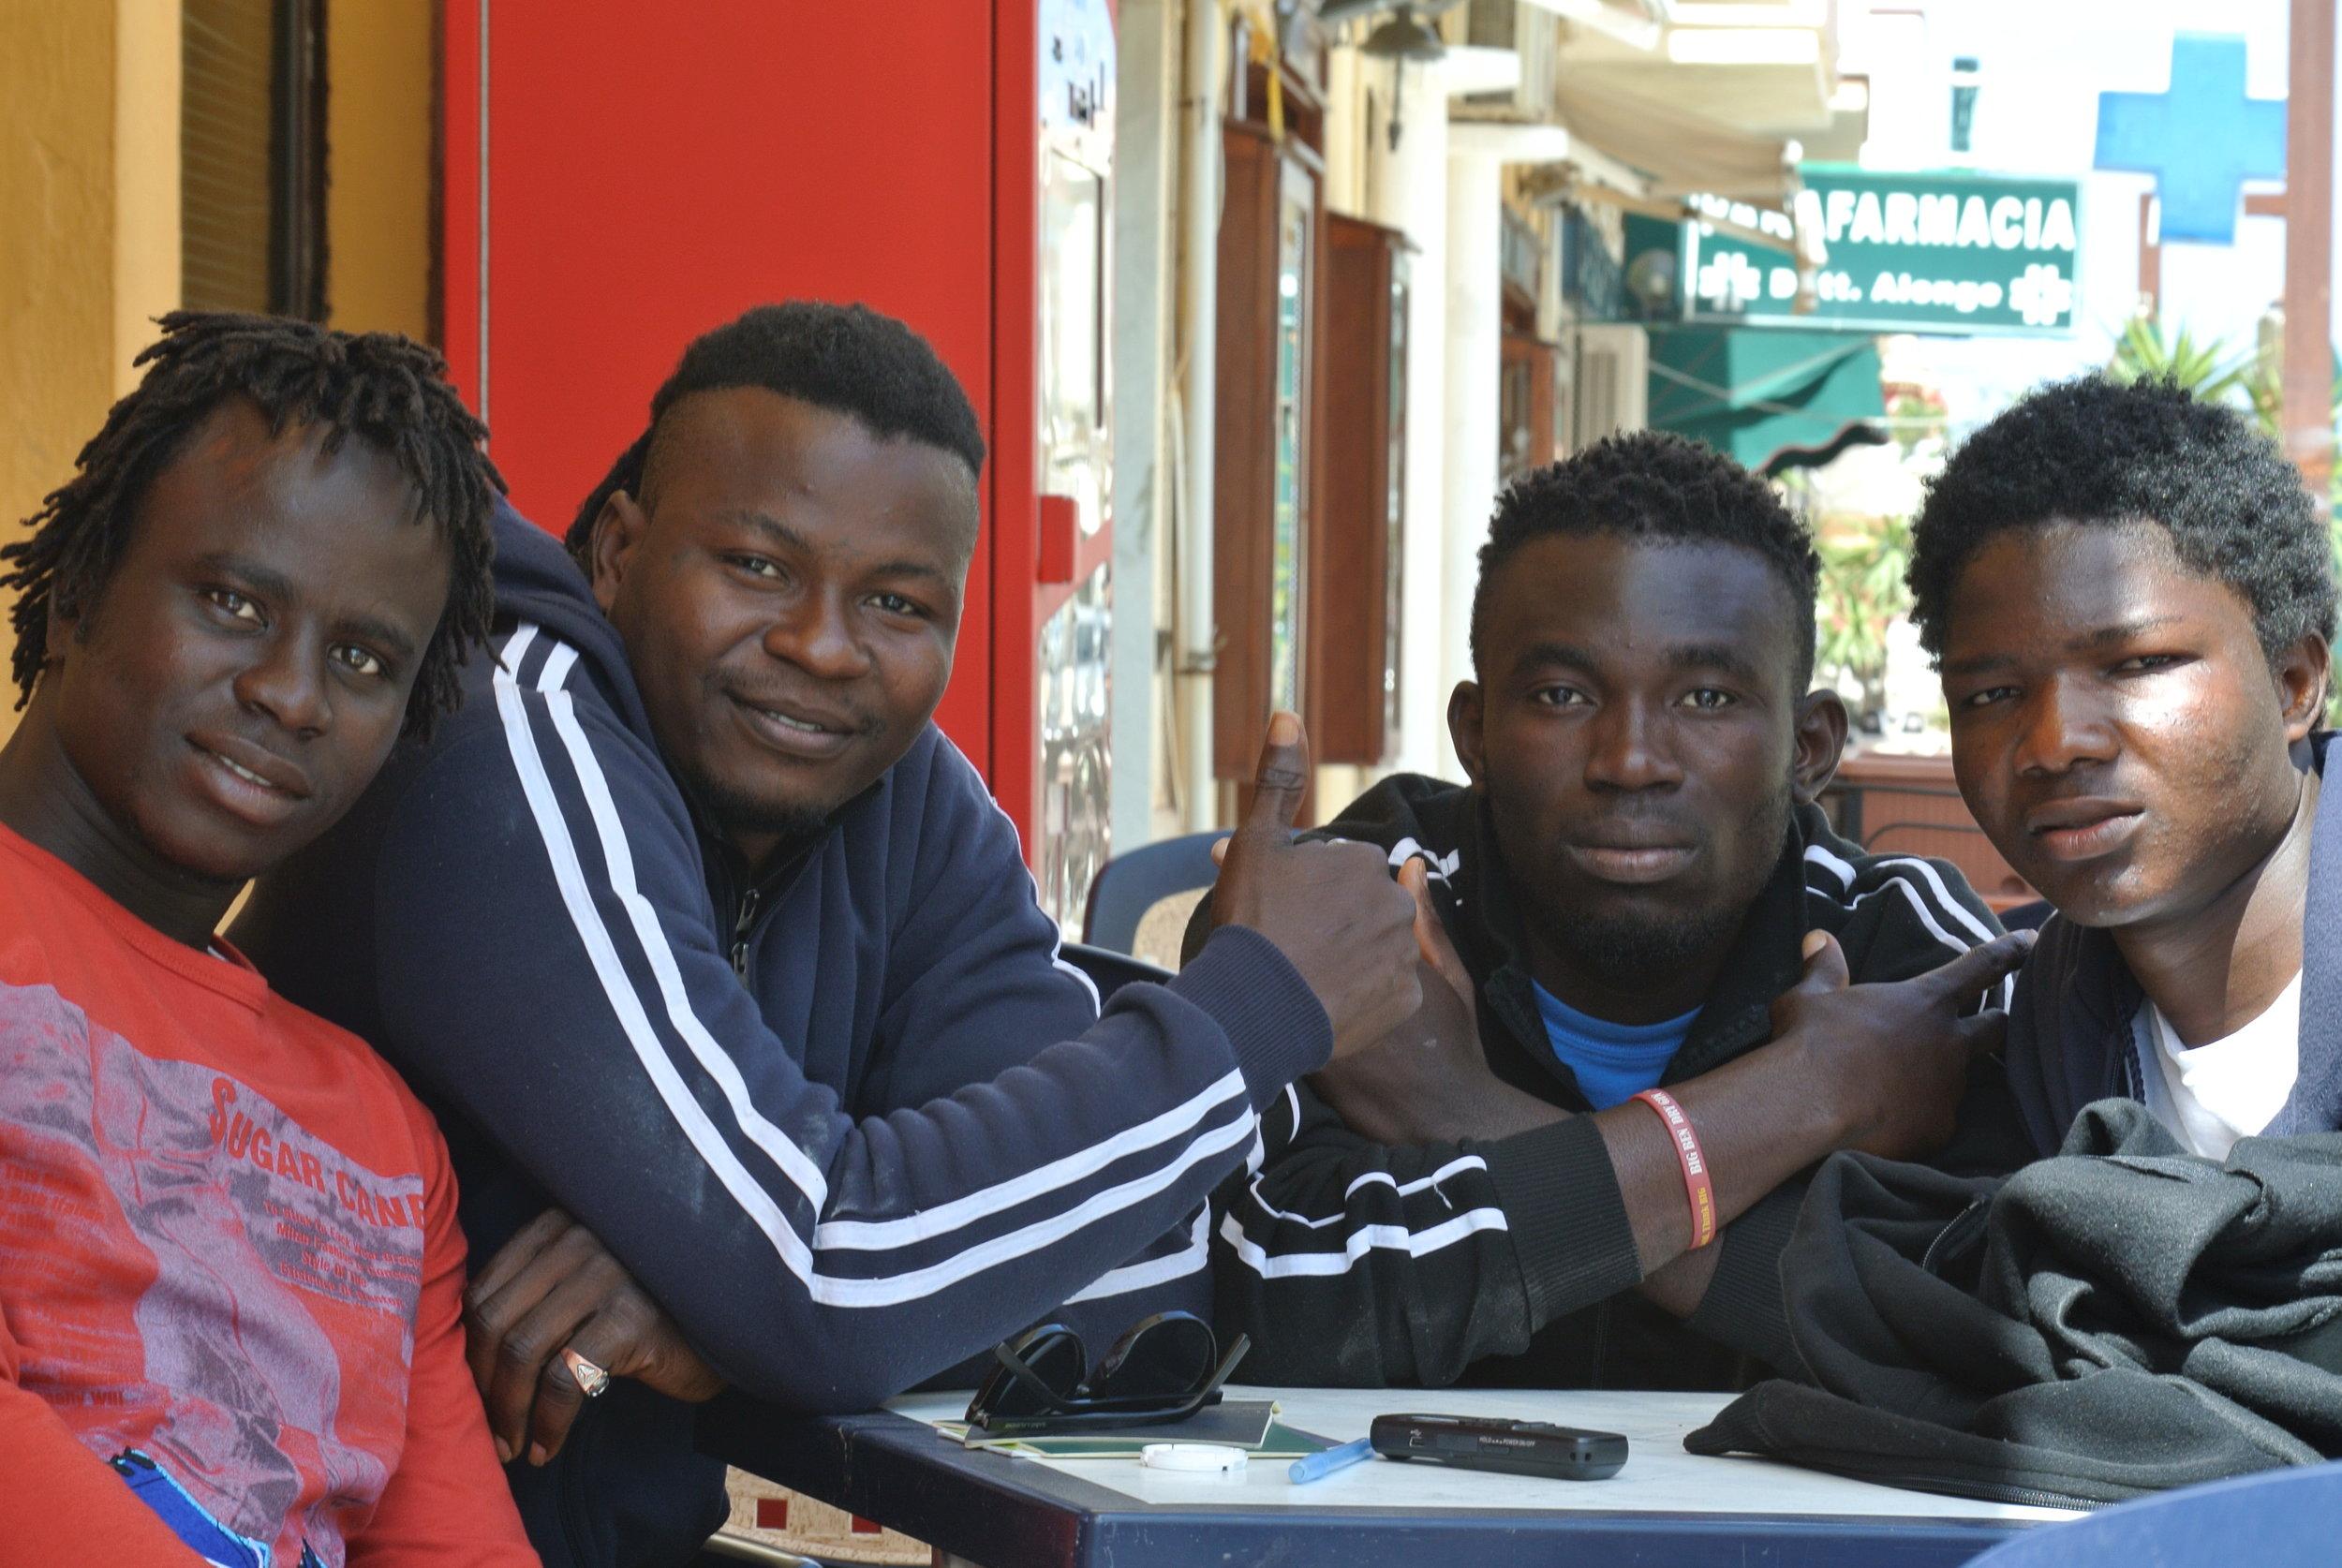 Yeussupha (17, Gambia),    Prince    (25, Nigeria),    Destiny    (22, Nigeria), and    Souleman    (19, Gambia), in Lampedusa, 29 April 2017. © Pamela Kerpius